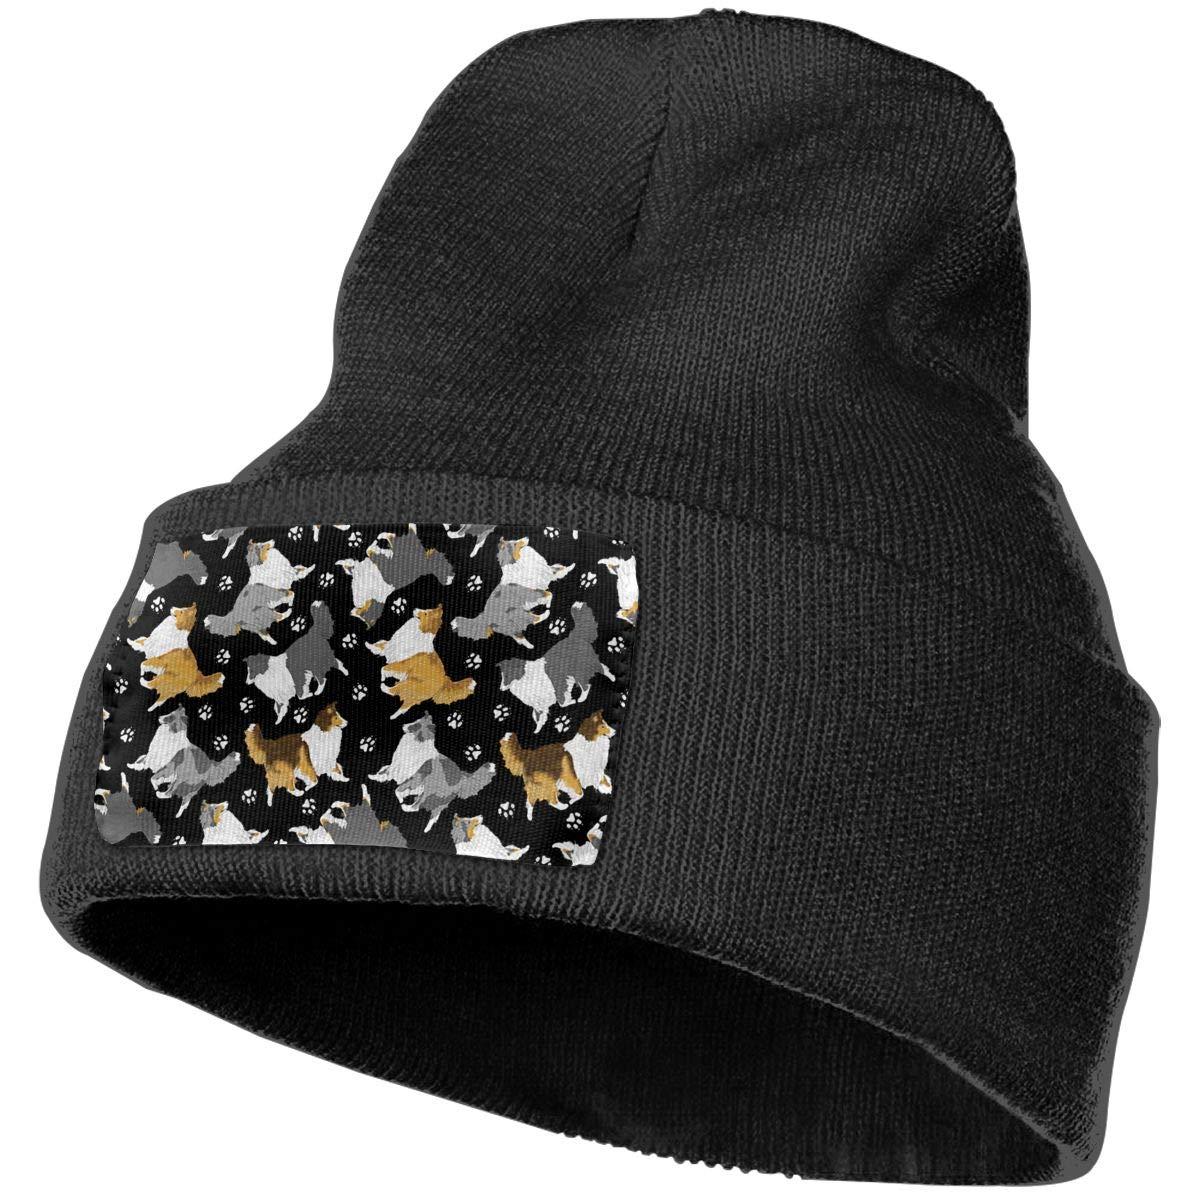 Trotting Shelties Unisex Stylish Knitting Beanie Hat Skull Rollup Hats